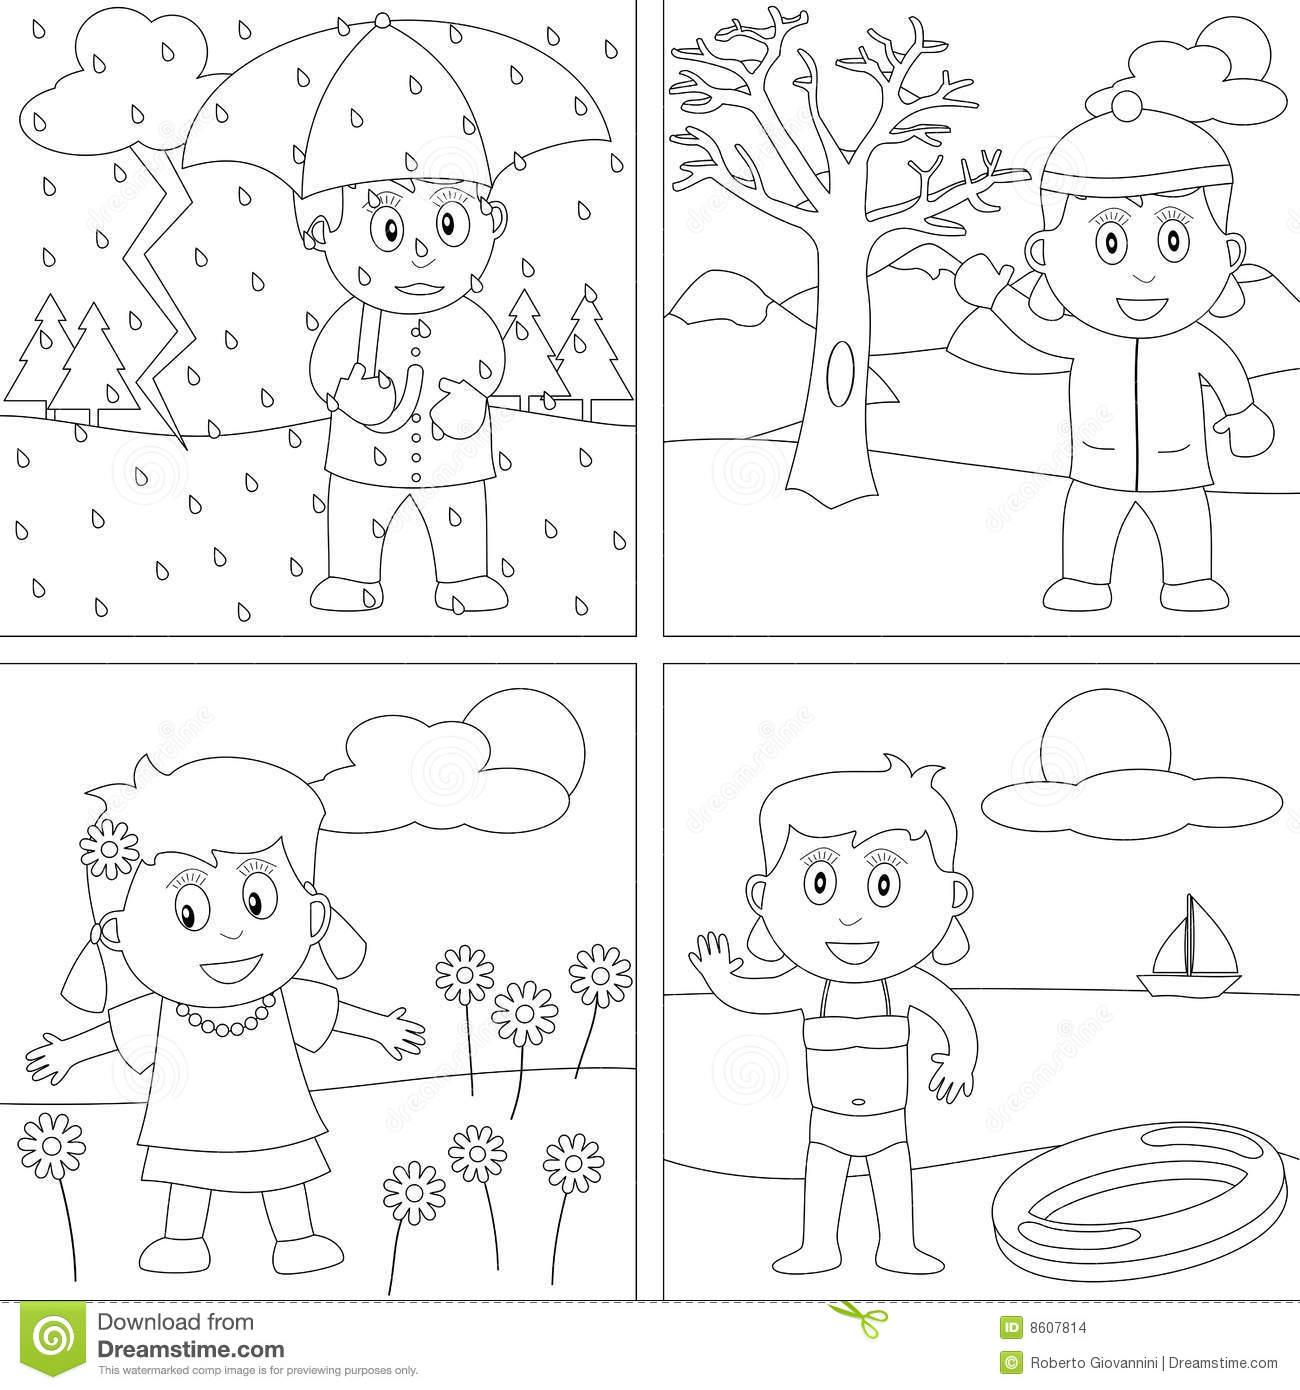 Four Seasons Worksheets For Kids